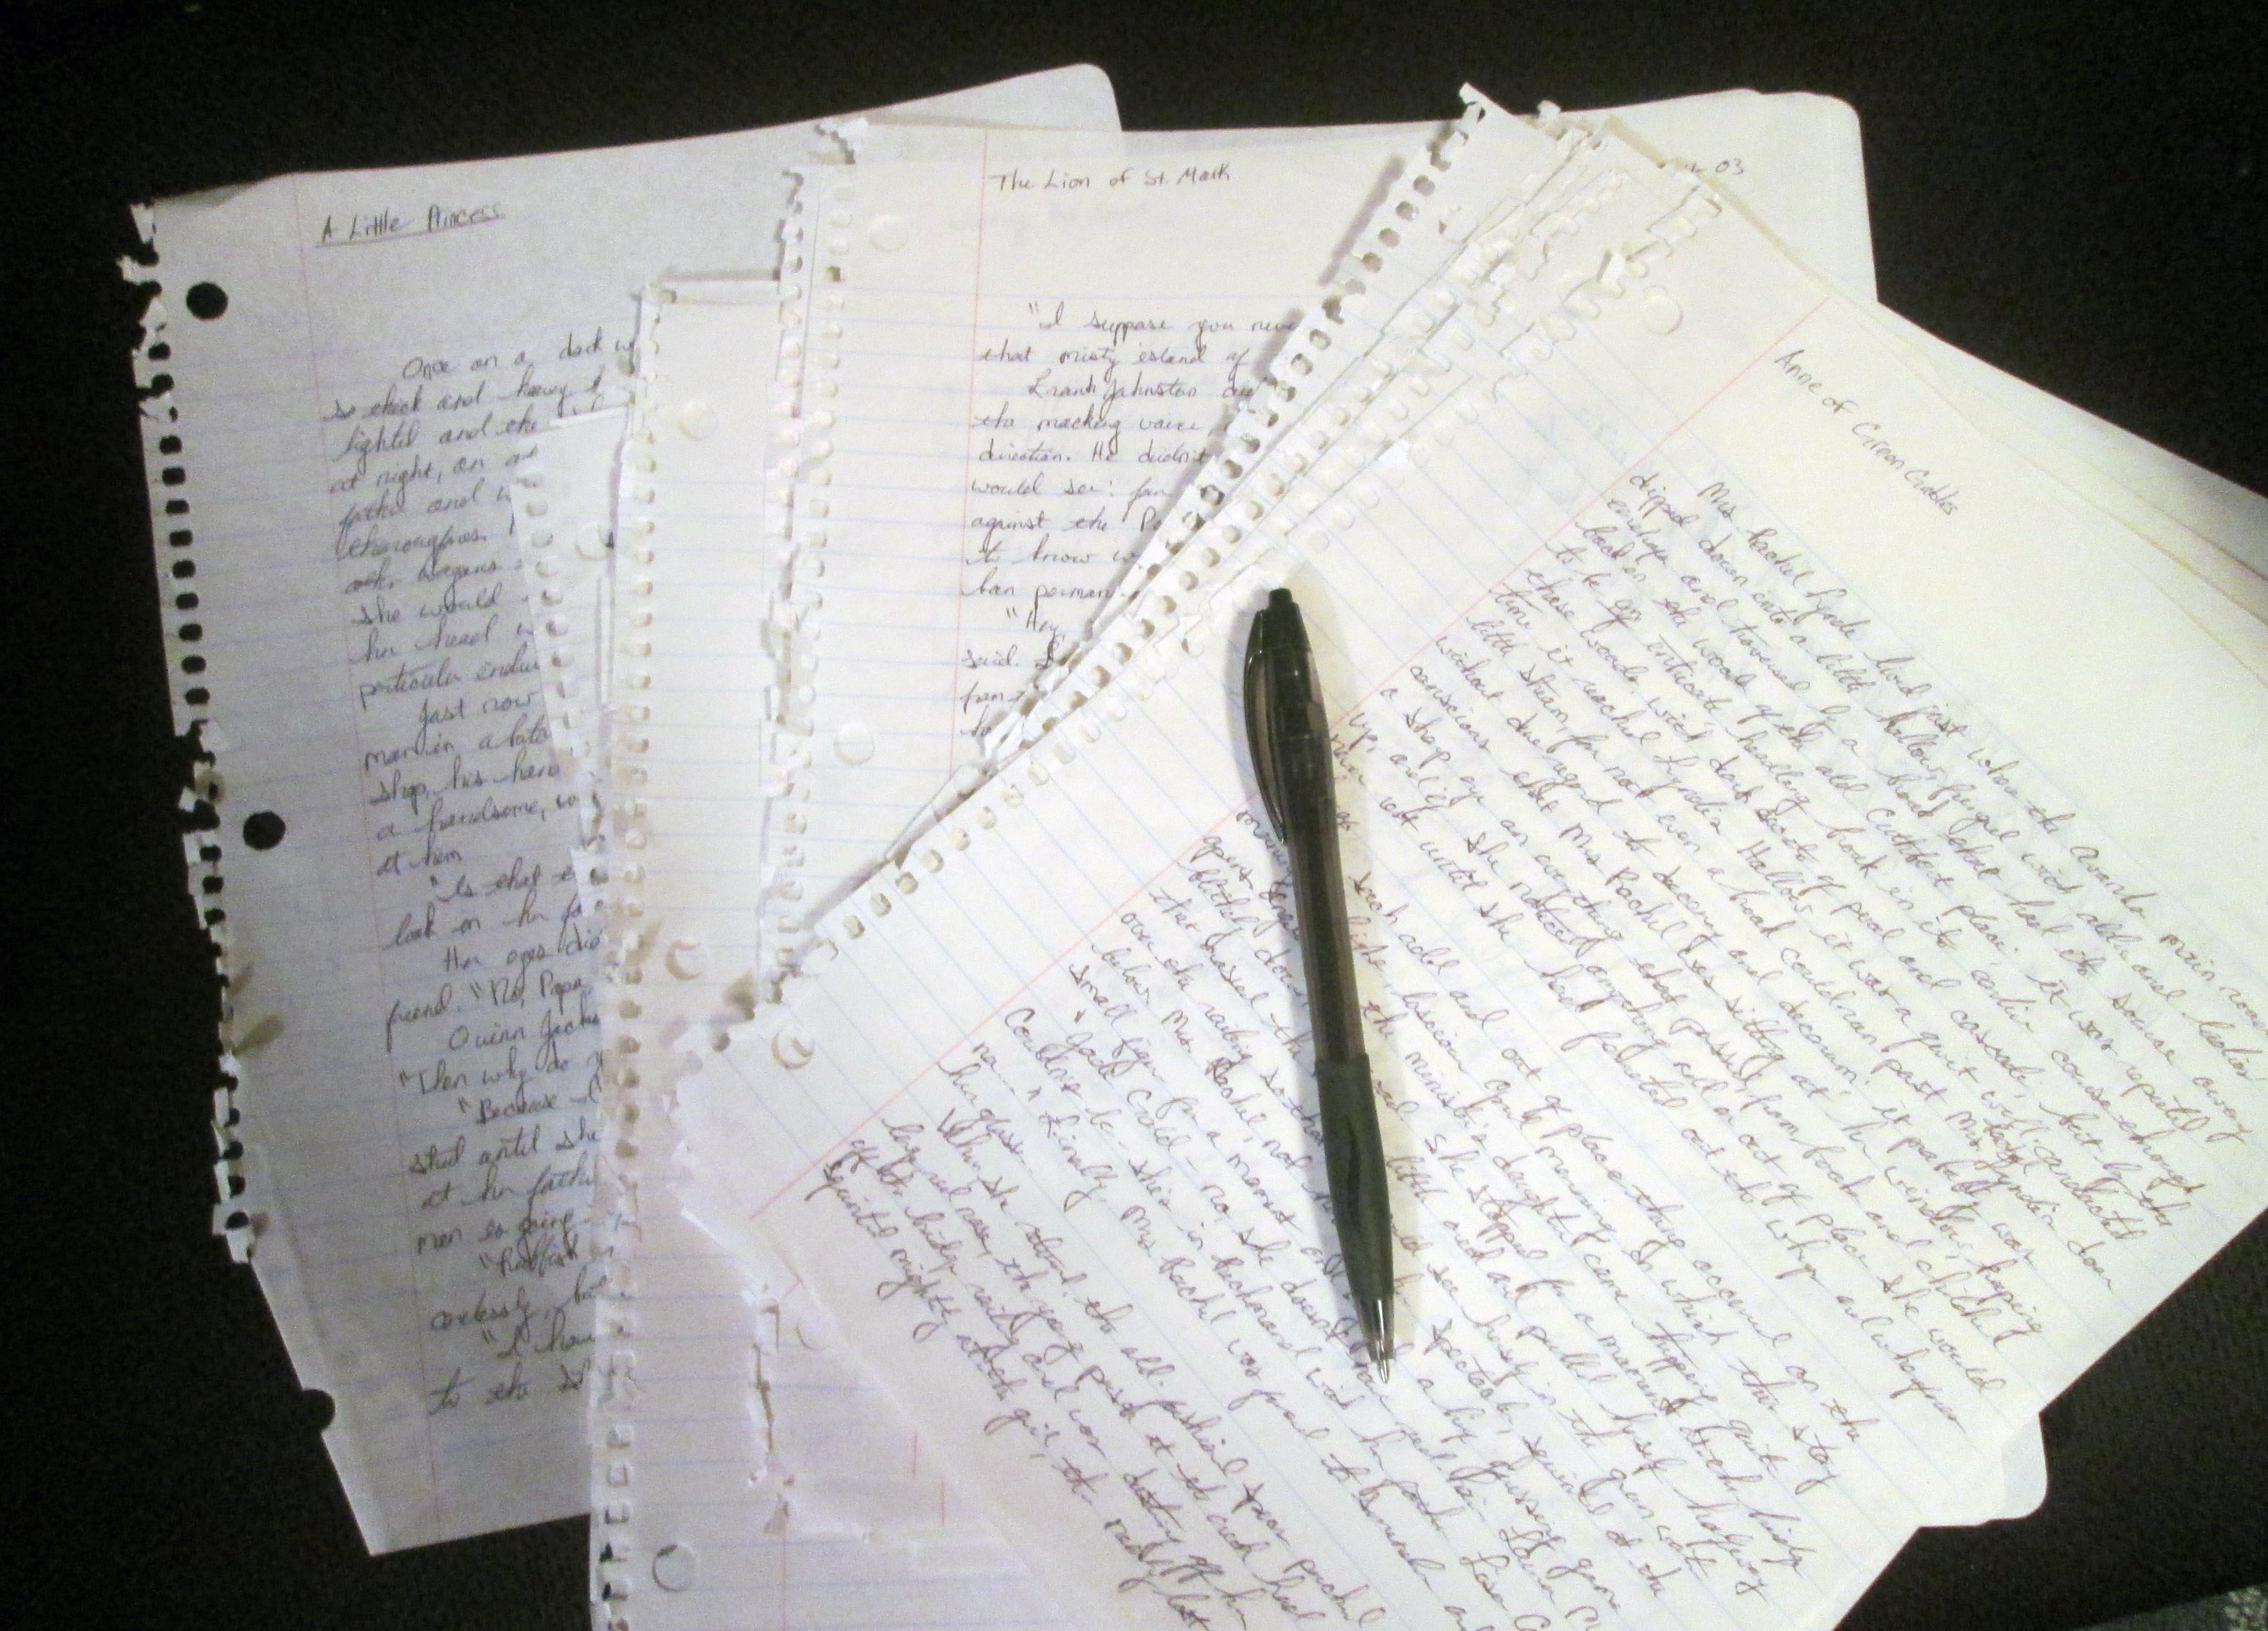 Transcription of Favorite Authors K.M. Weiland